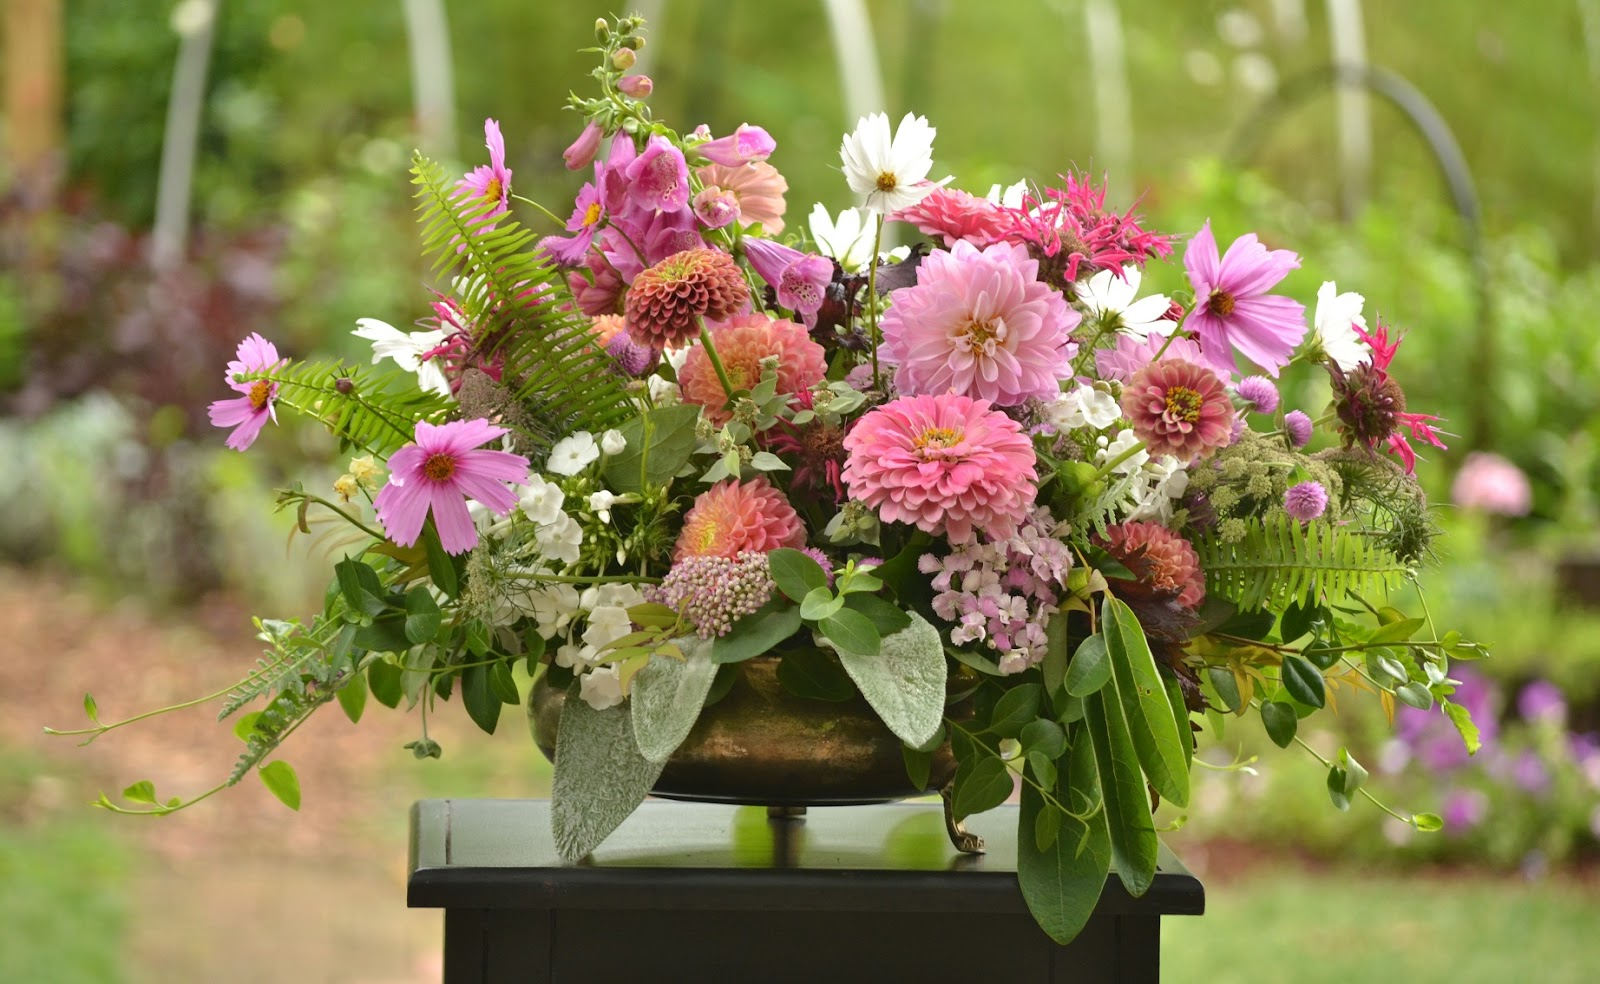 Wedding Flowers from Springwell: Dahlias for Stunning Centerpiece Designs